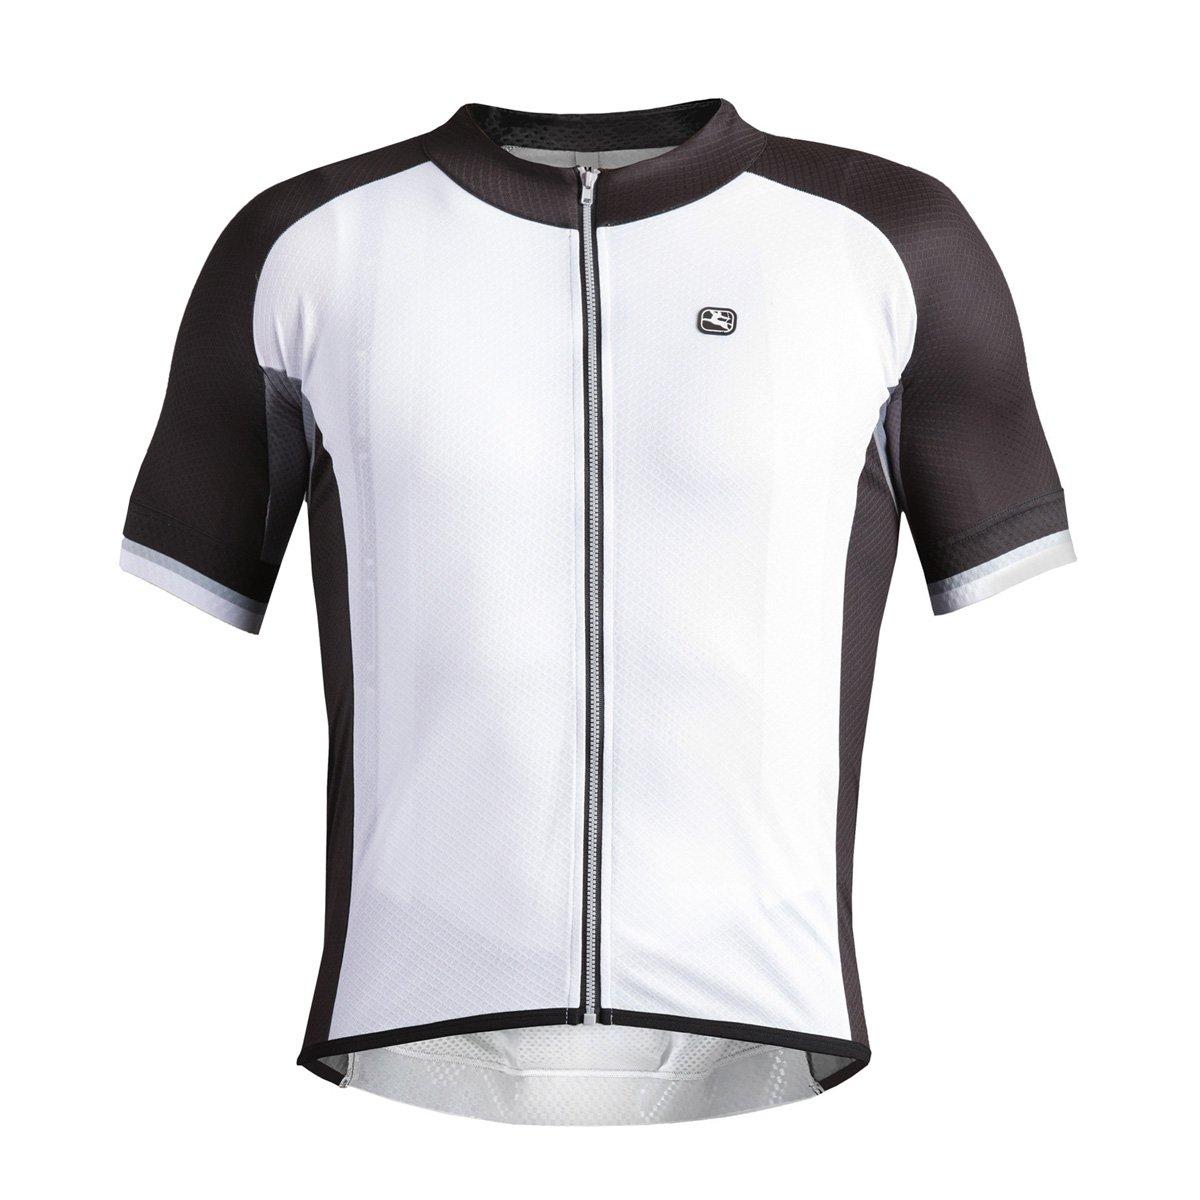 Giordana 2016メンズSilverline半袖サイクリングジャージー – gi-s6-ssjy-silv B079C7CY2J Large|ホワイト/ブラック/グレー ホワイト/ブラック/グレー Large